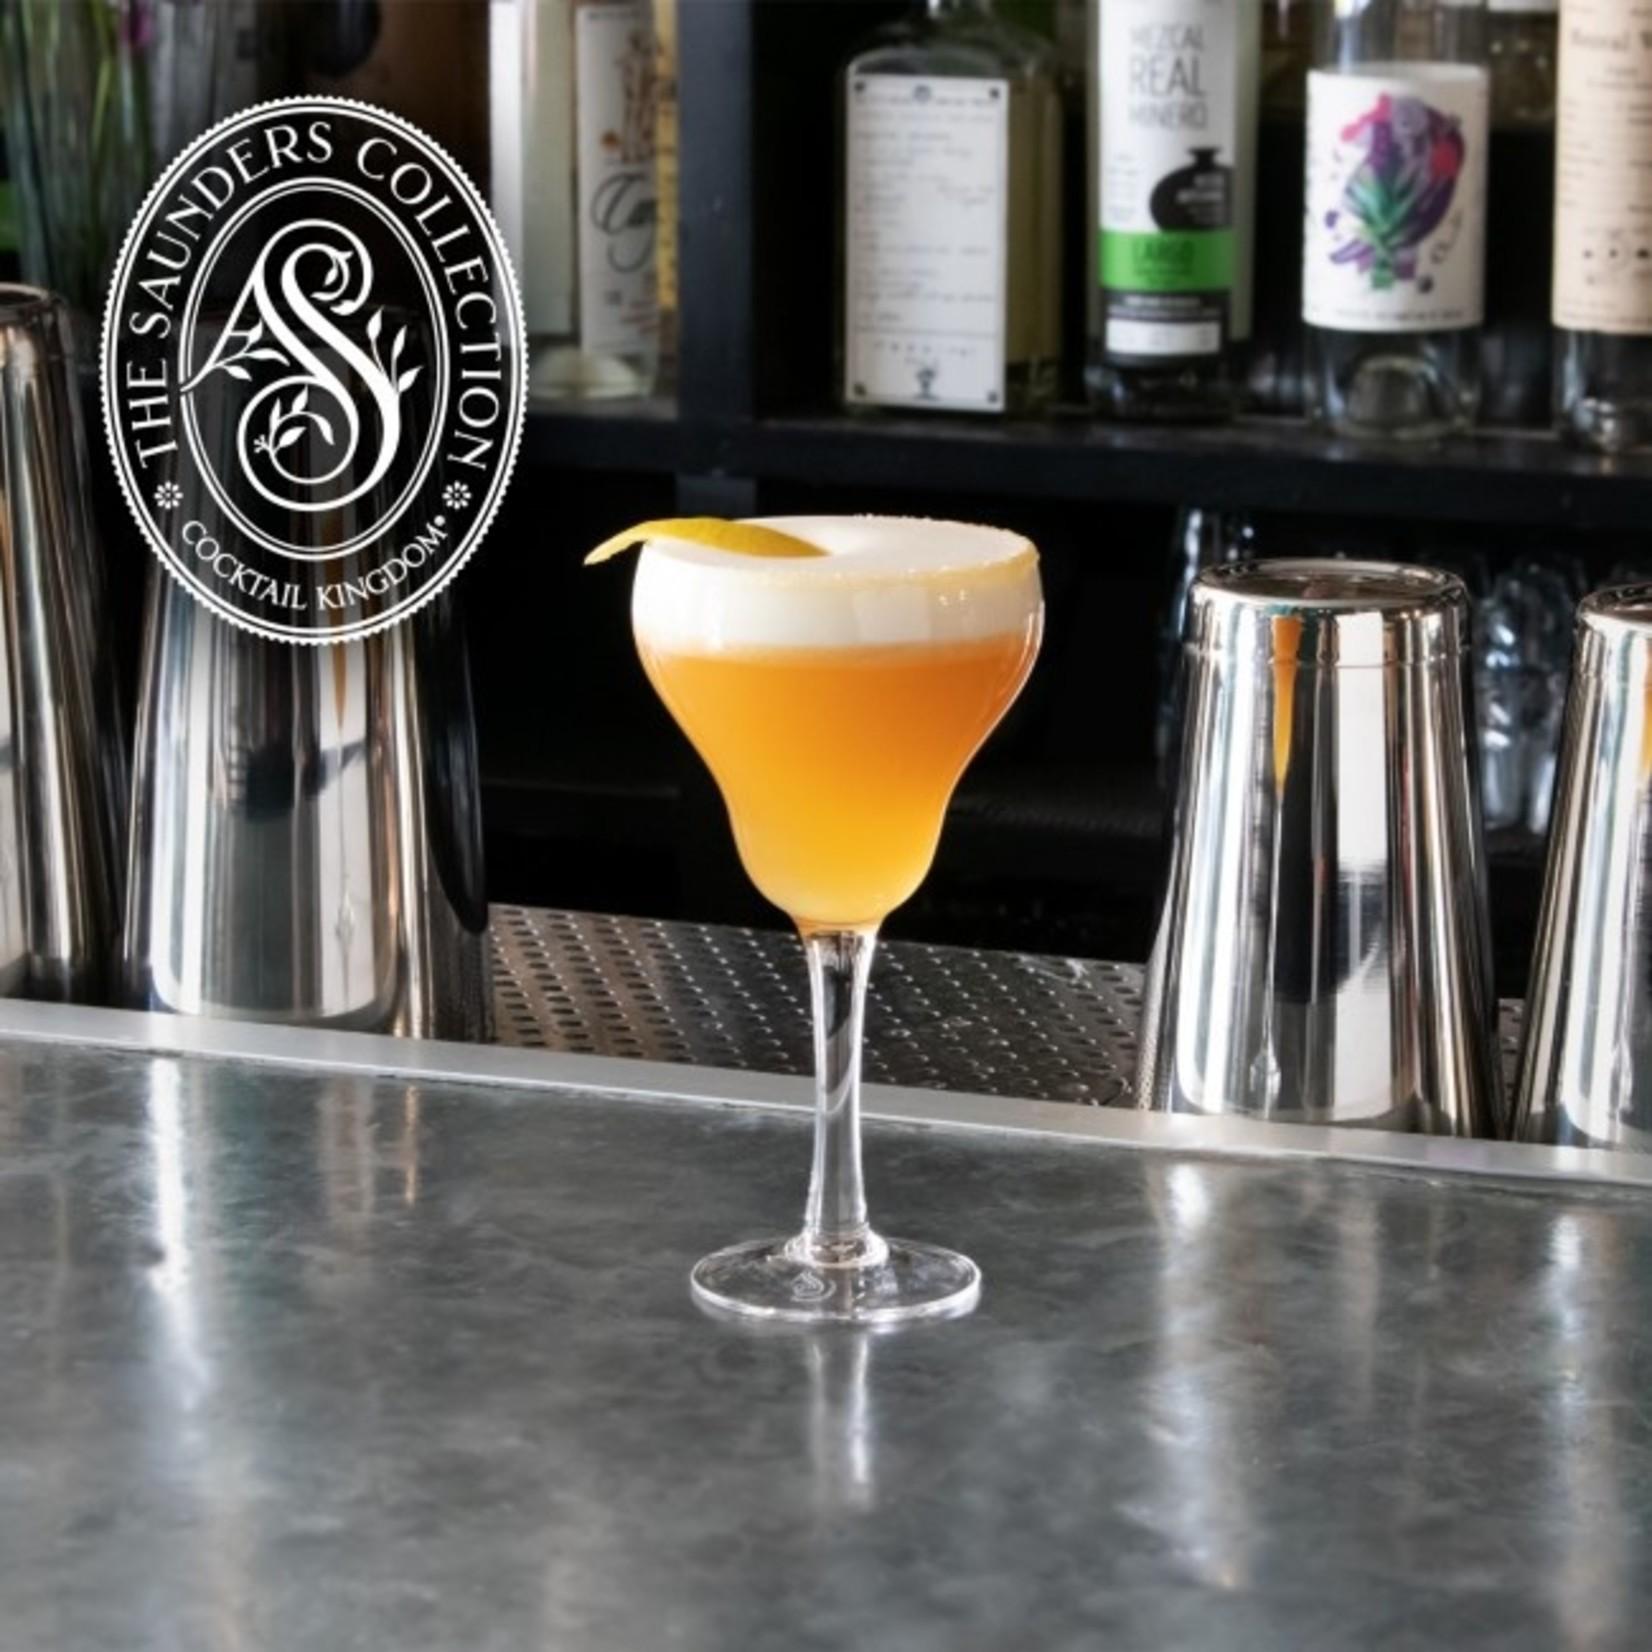 Cocktail Kingdom Audrey Saunders Sour Glass